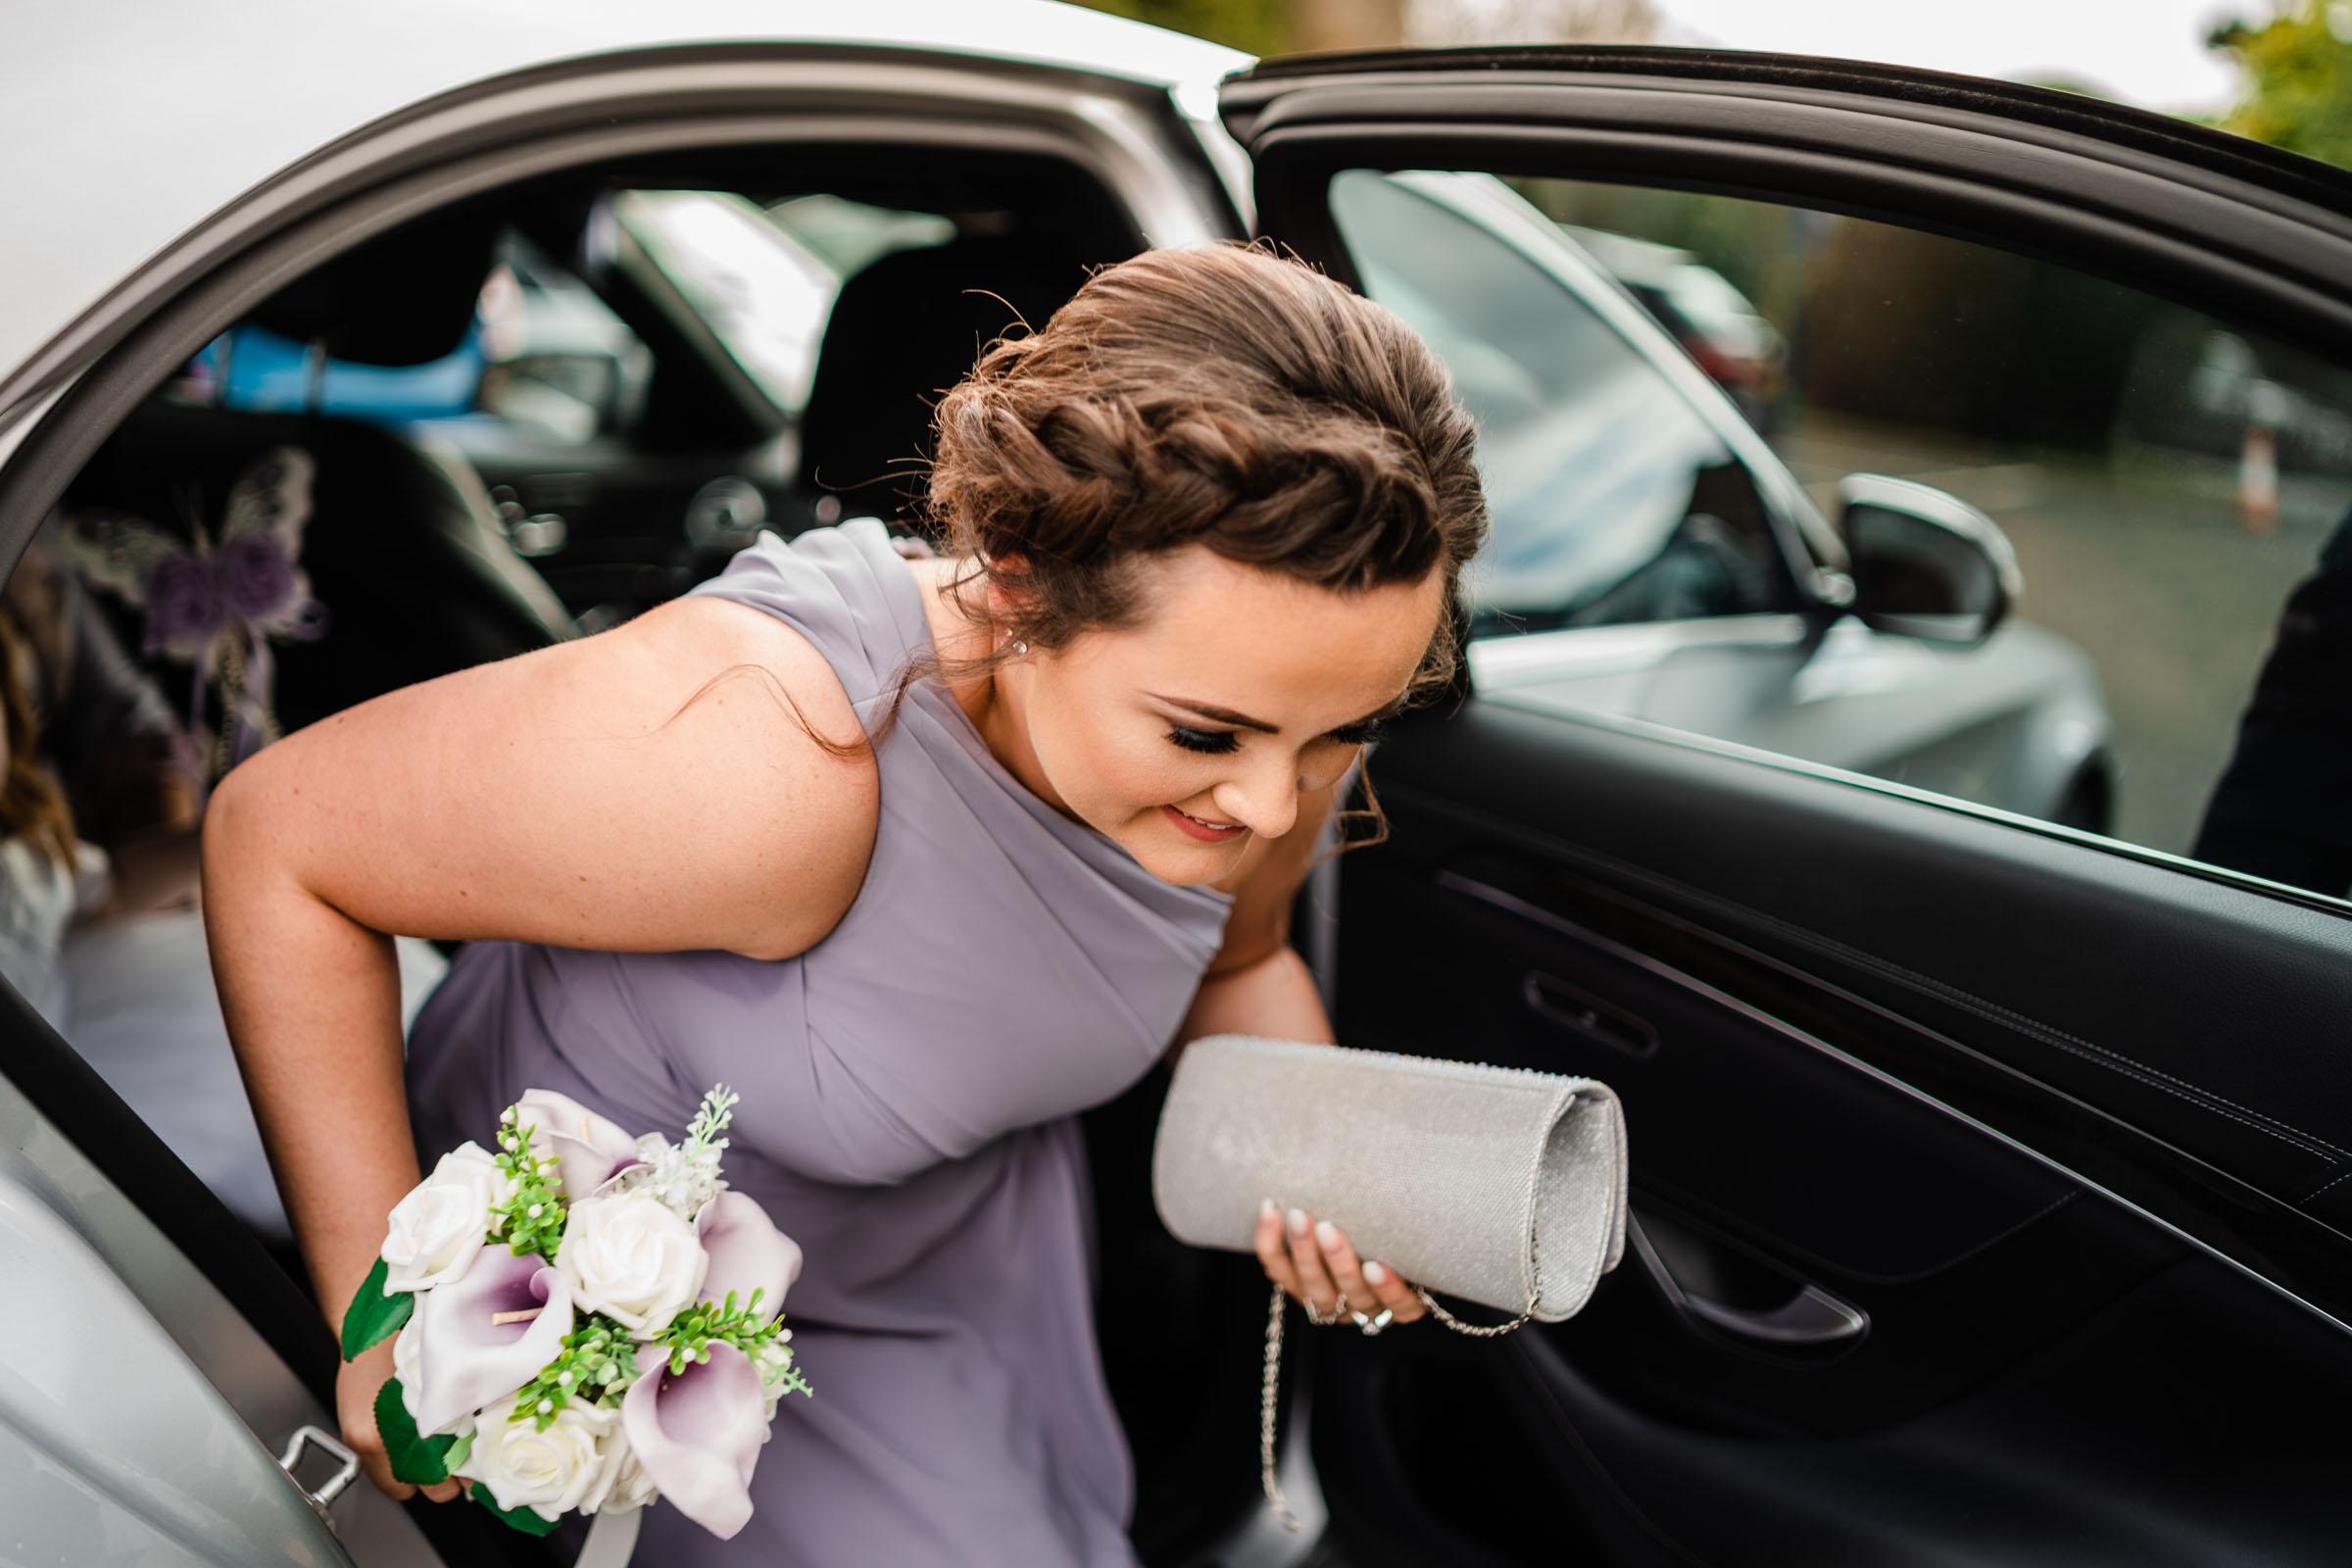 motherwell-moorings-wedding-photographer-dearlyphotography (26 of 77).jpg